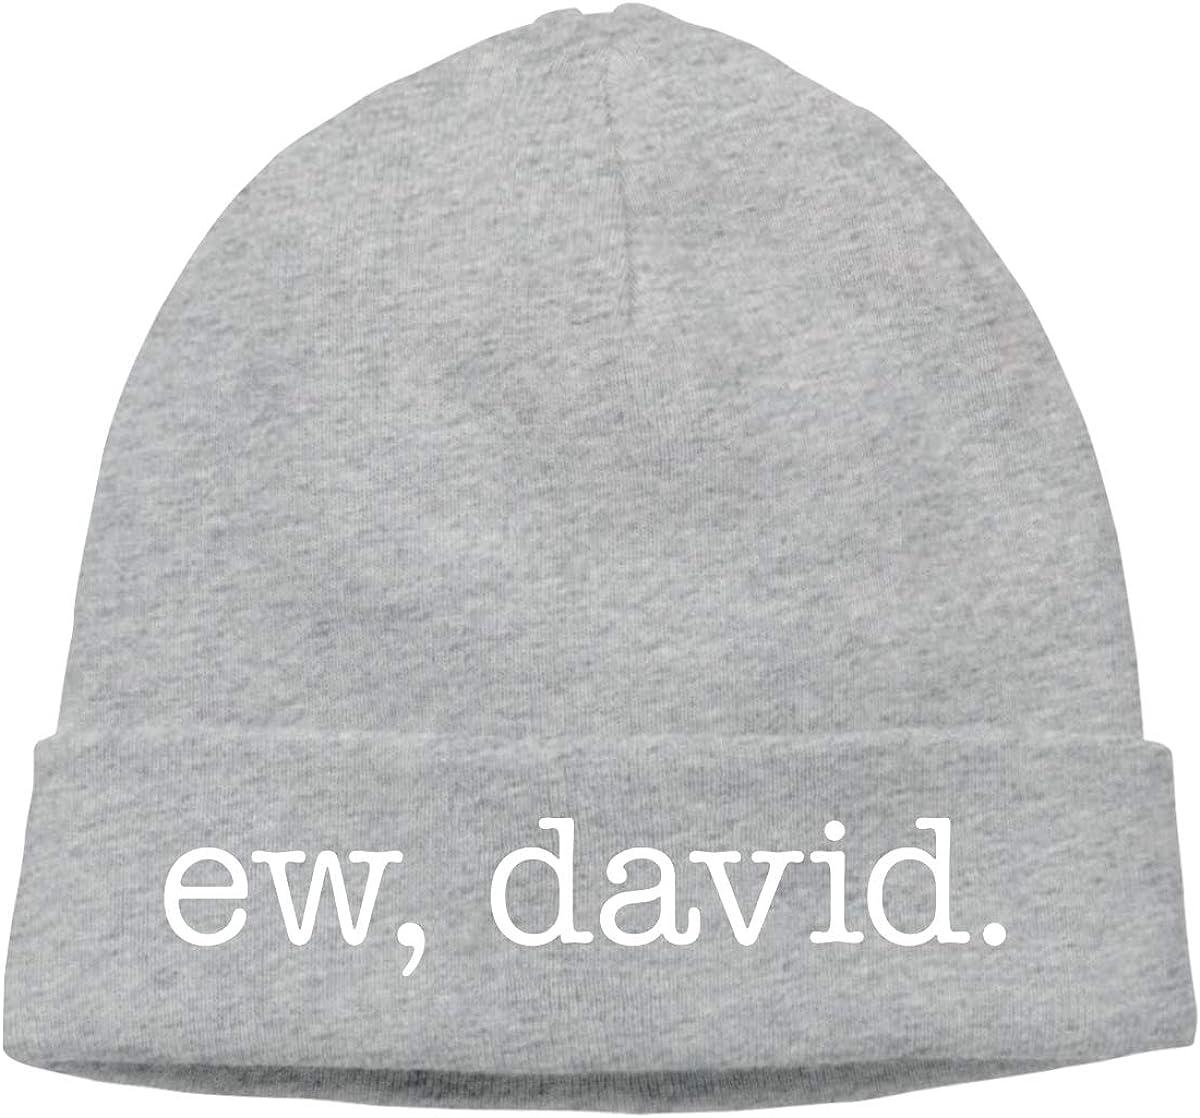 David Beanie Hat Knit Cap Winter Unisex Skully Hat TIANSHADEBIEGEN Ew